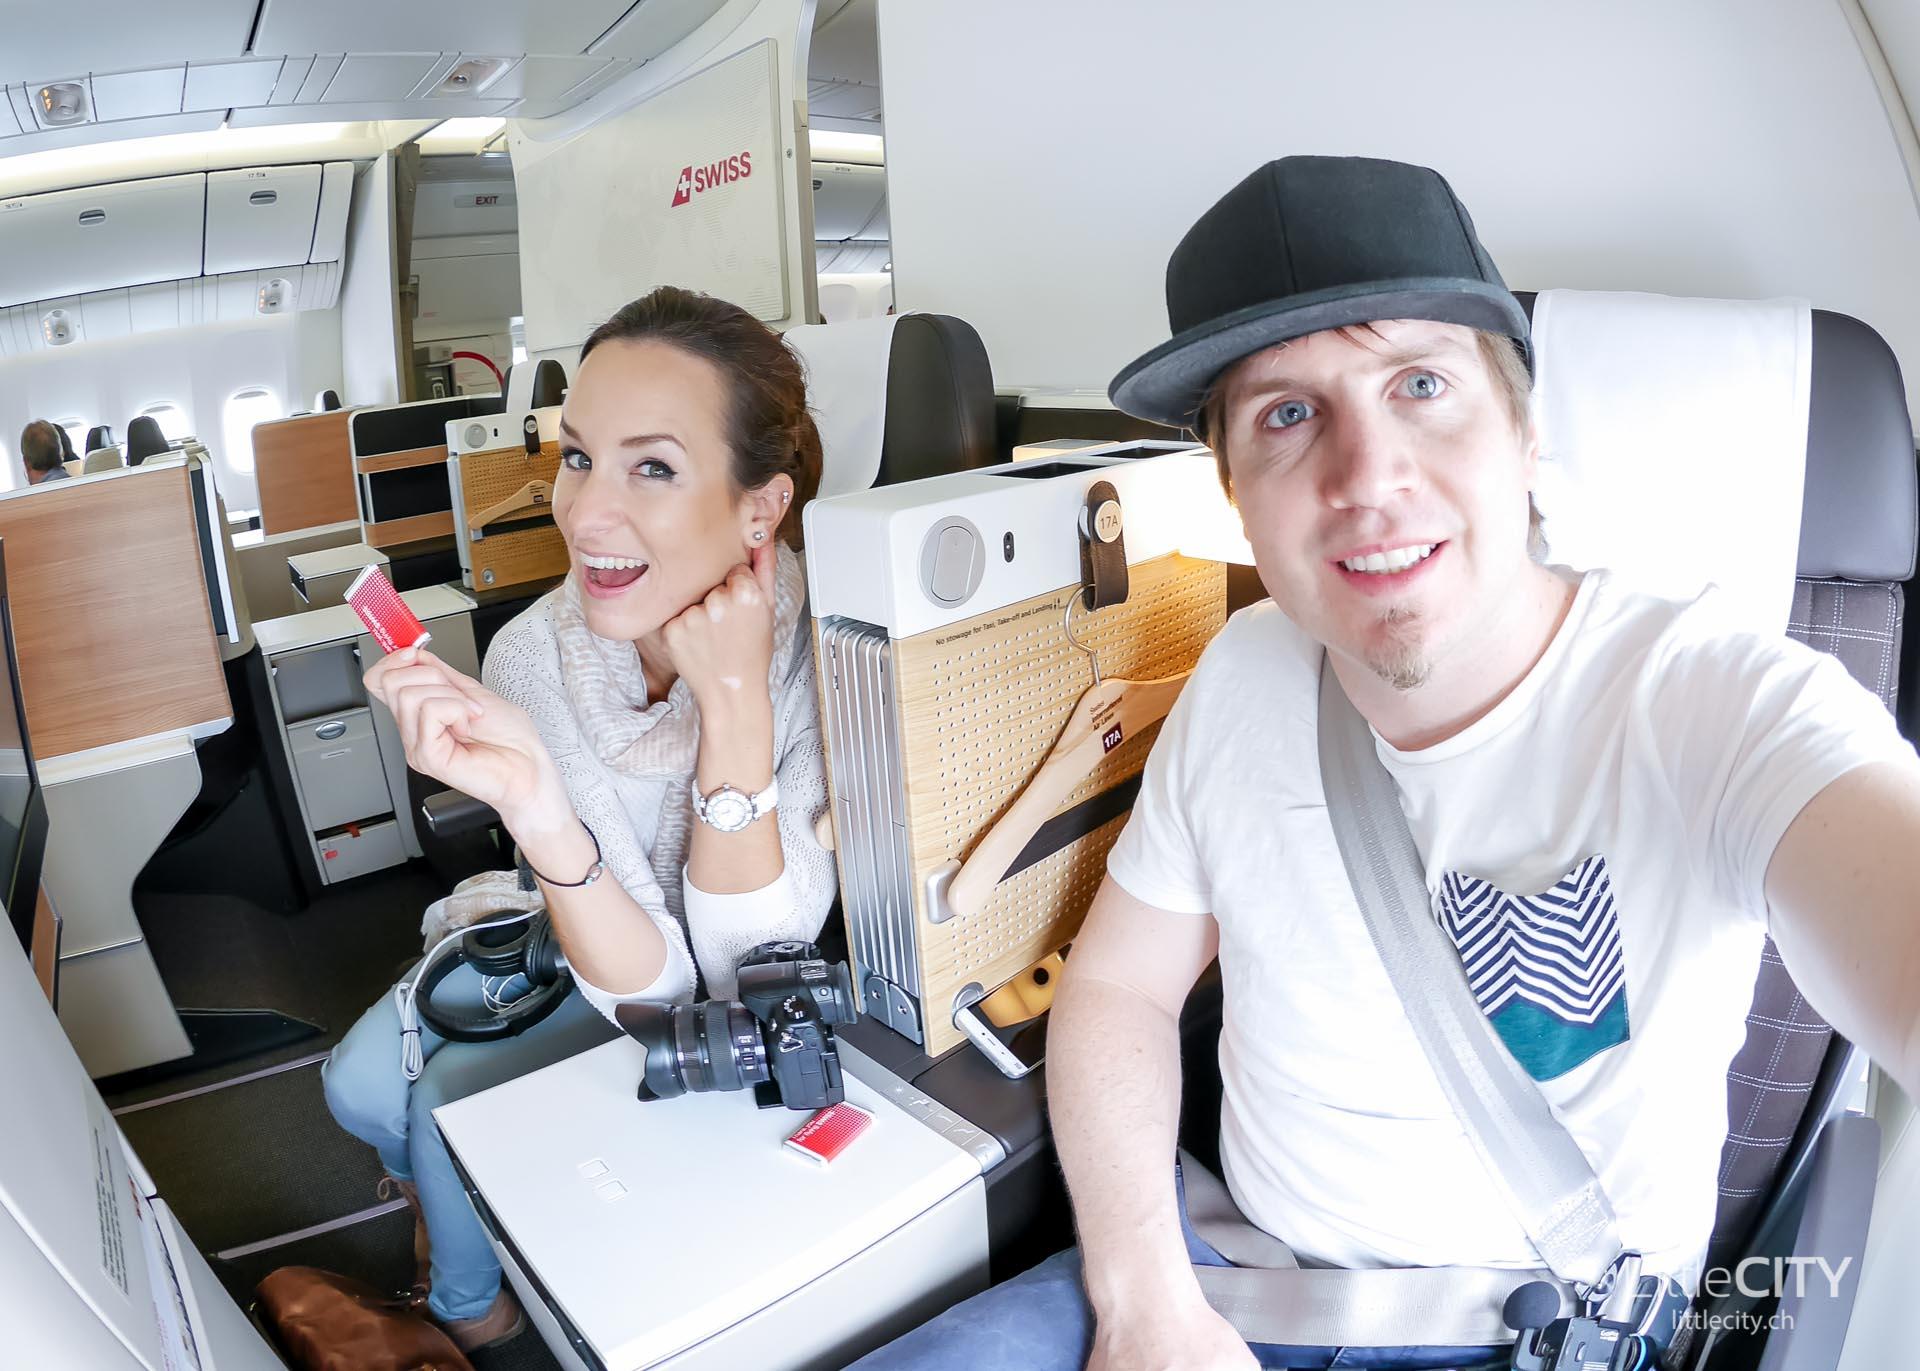 Swiss Boeing 777 Experience Flug LittleCITY Reiseblog-1